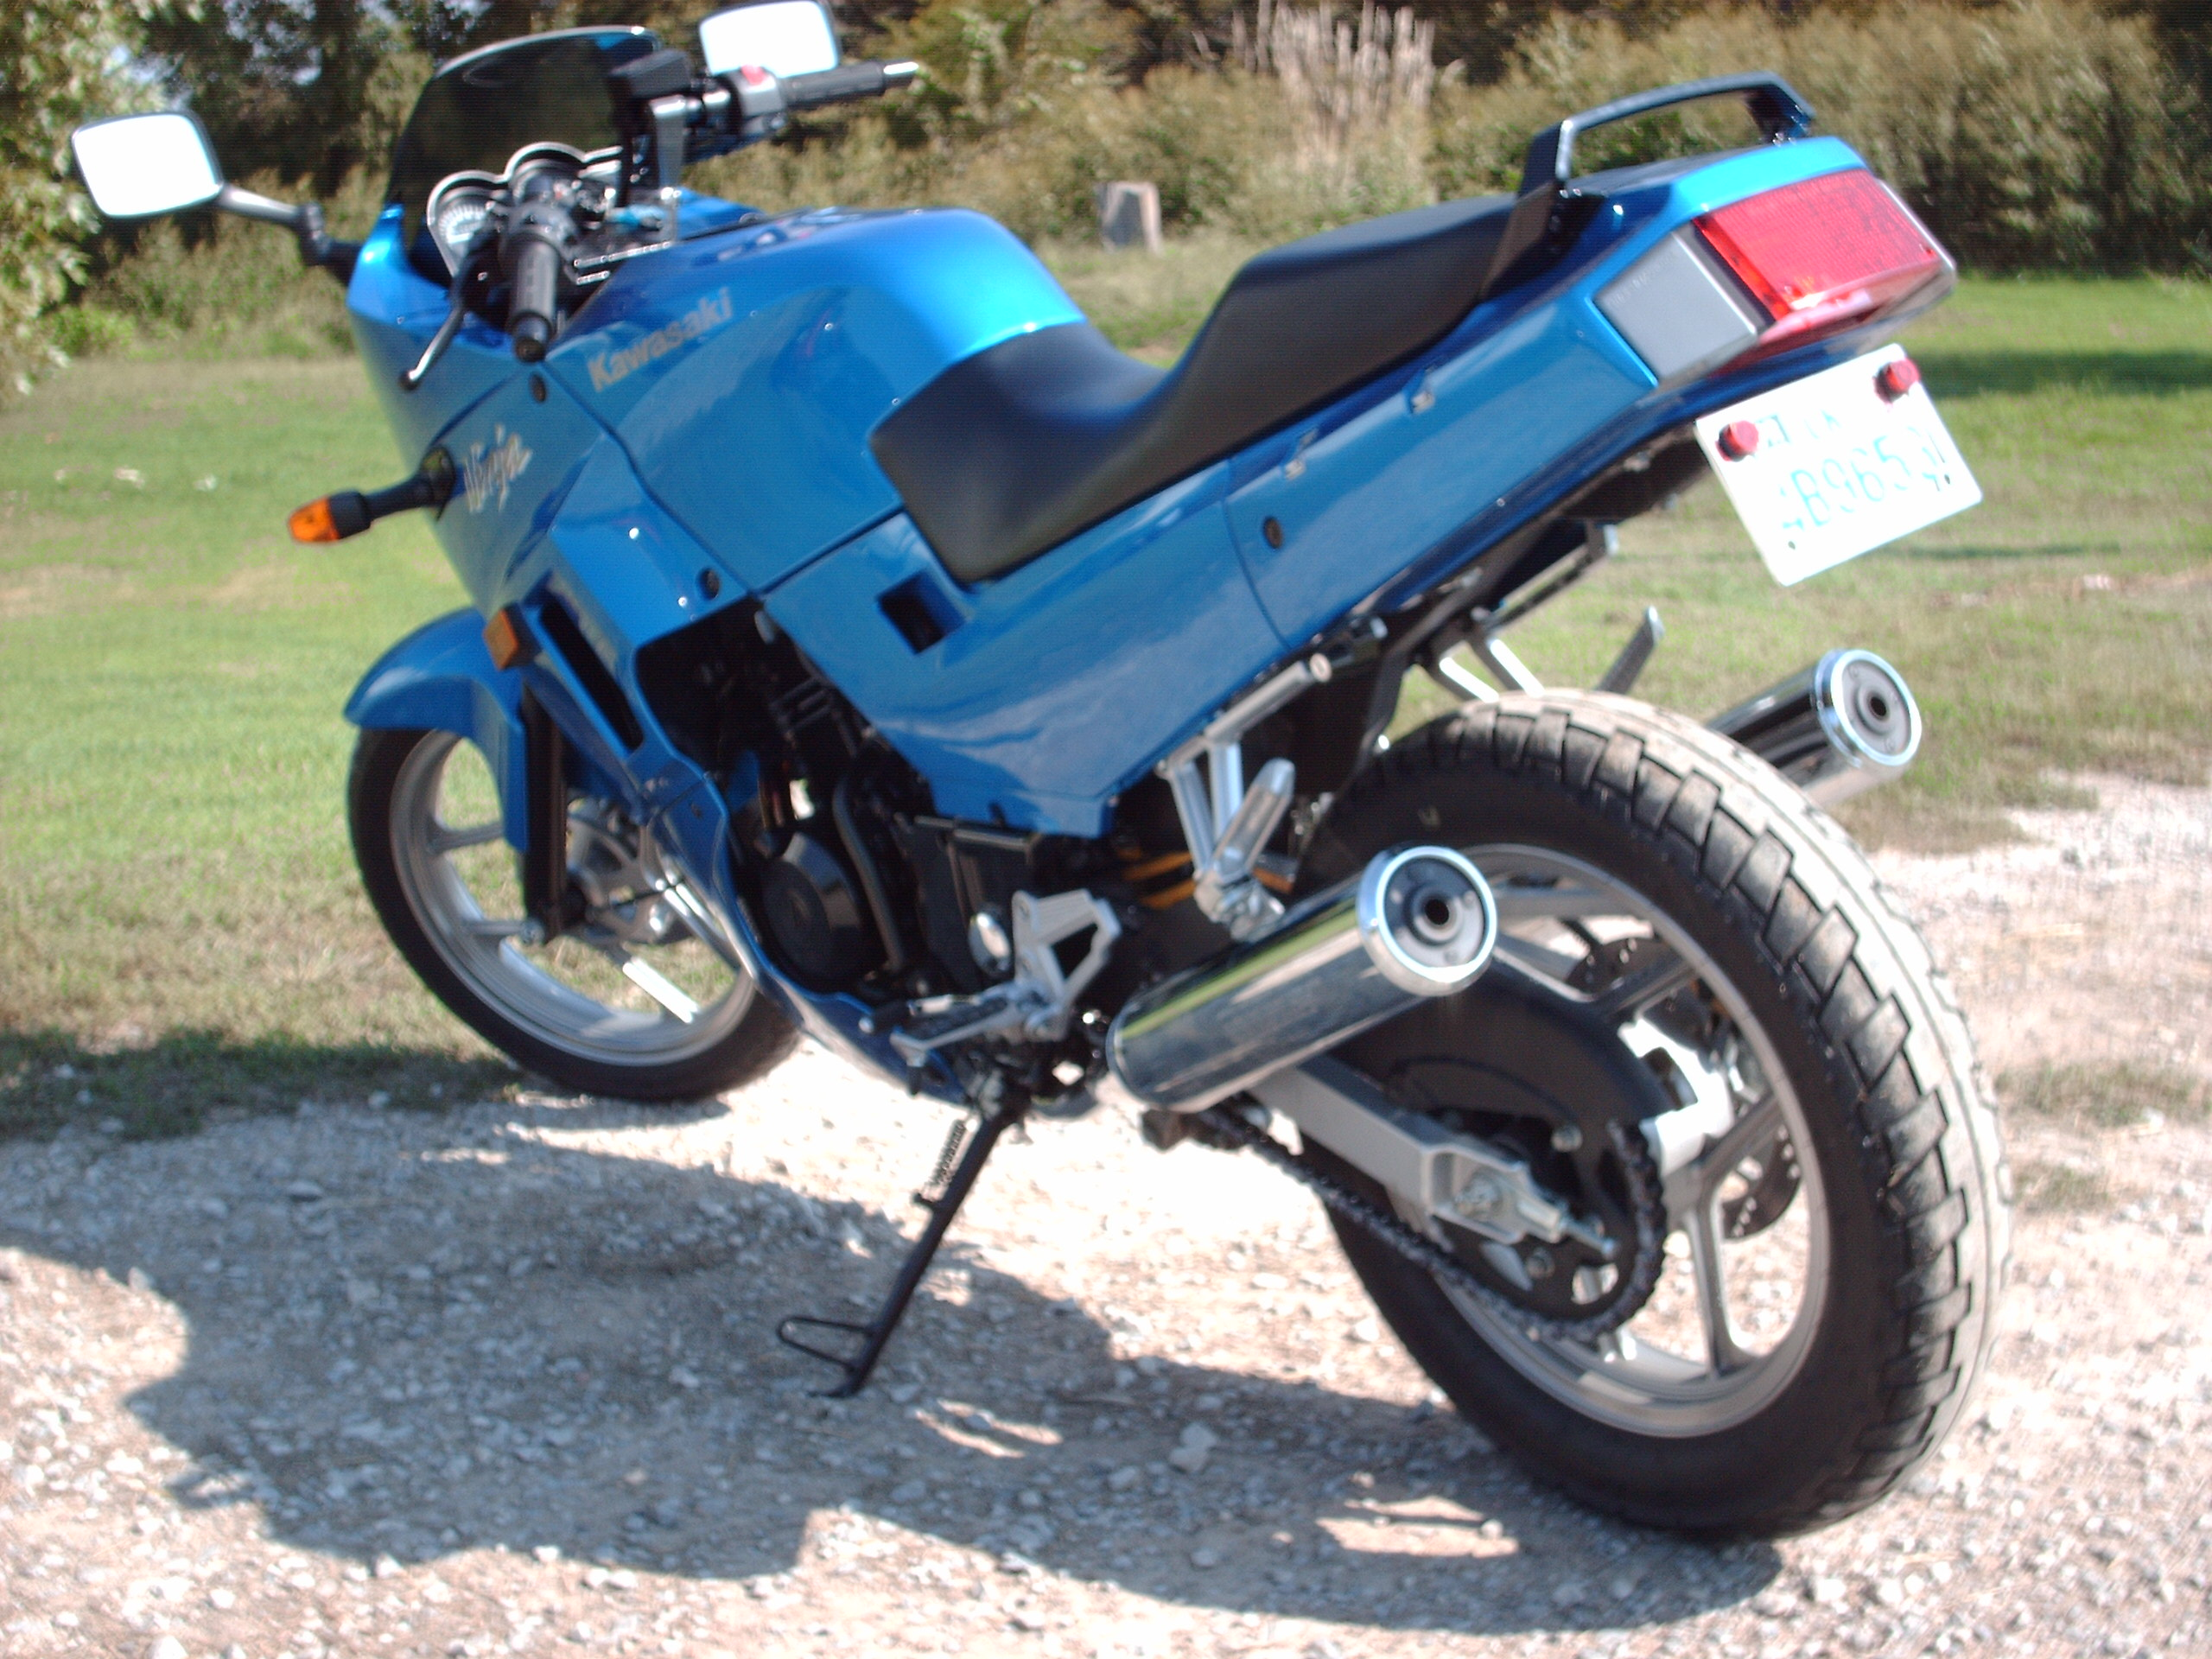 ninja 250 extended kickstand 4 sale sv650 or ex500 shock upgrade